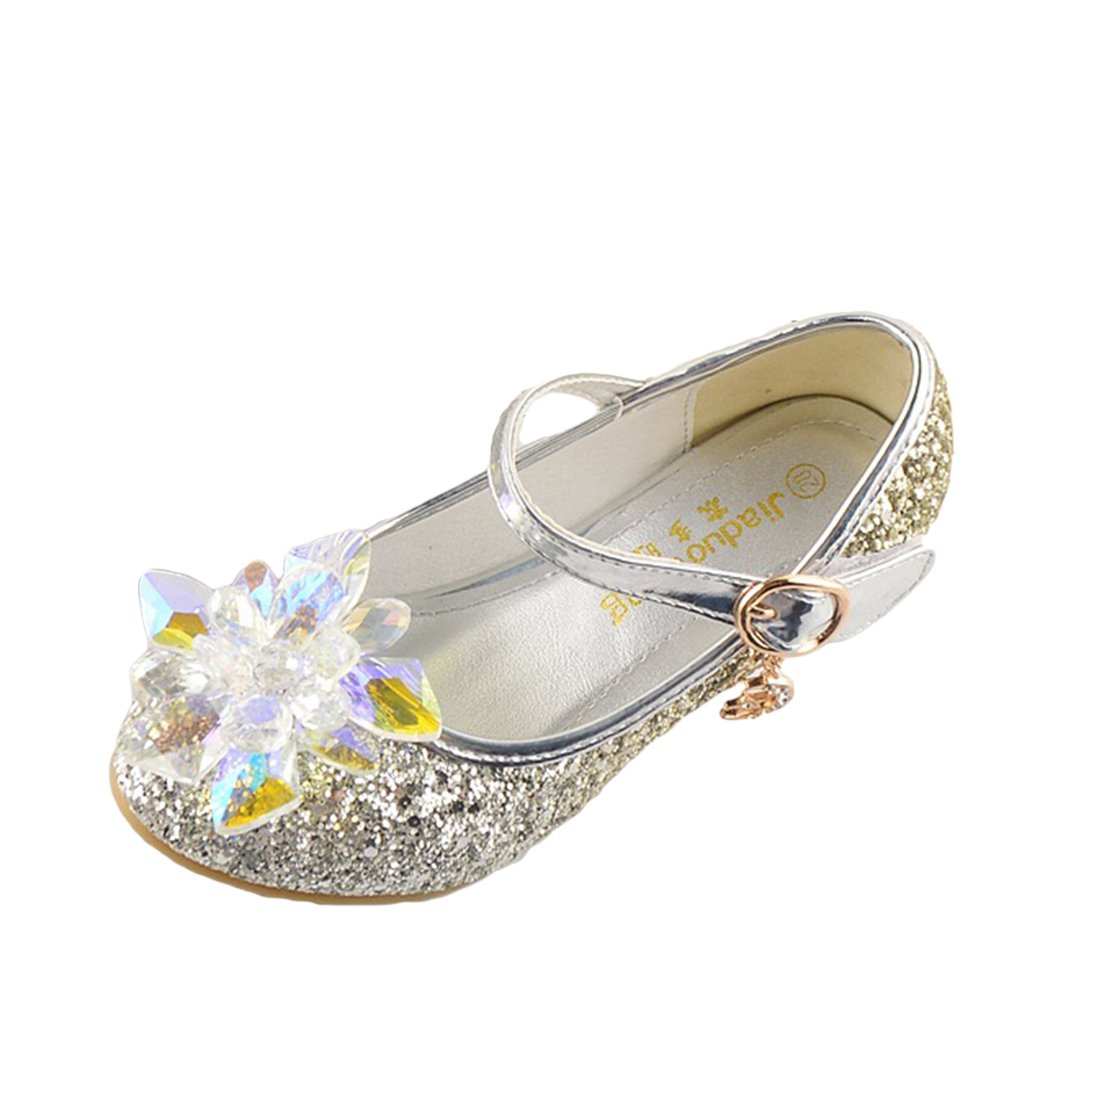 Toddler Little Big Kids Girls Princess Dress Up Shoes Glitter Dance Evening Party Wedding Shoes